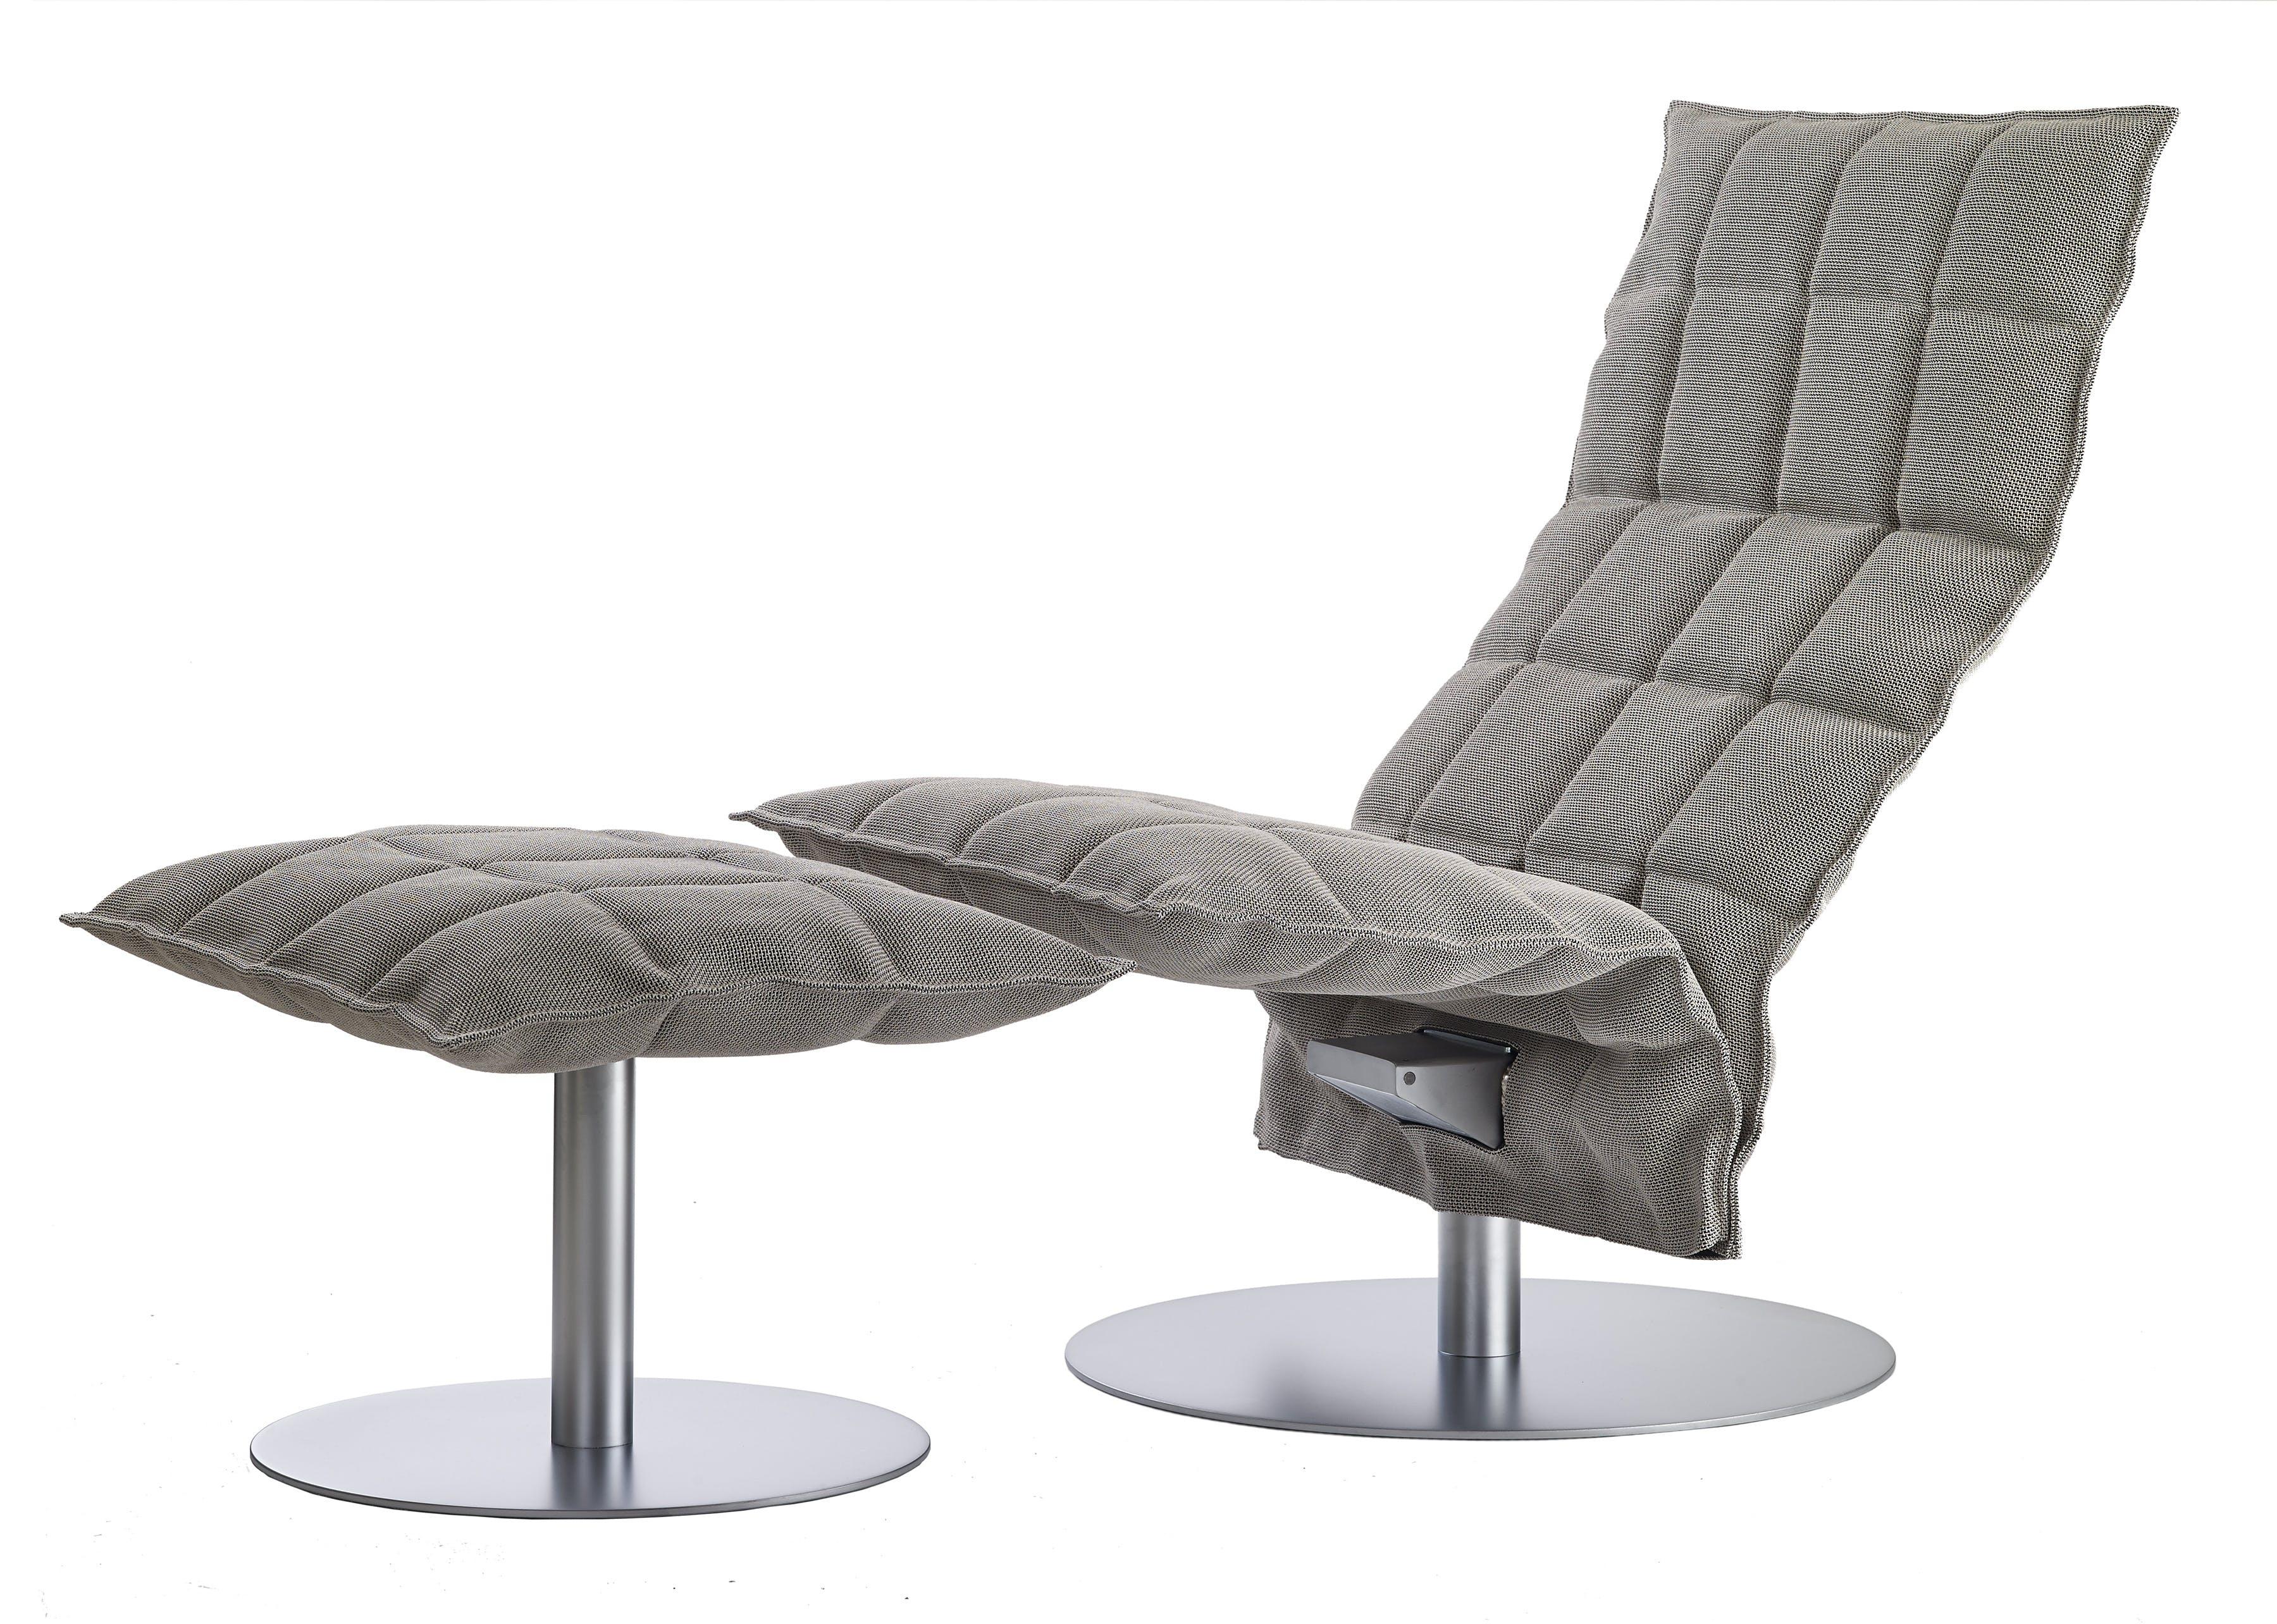 46007 Narrow Swivel K Chair With 46017 Narrow K Ottoman With Plate